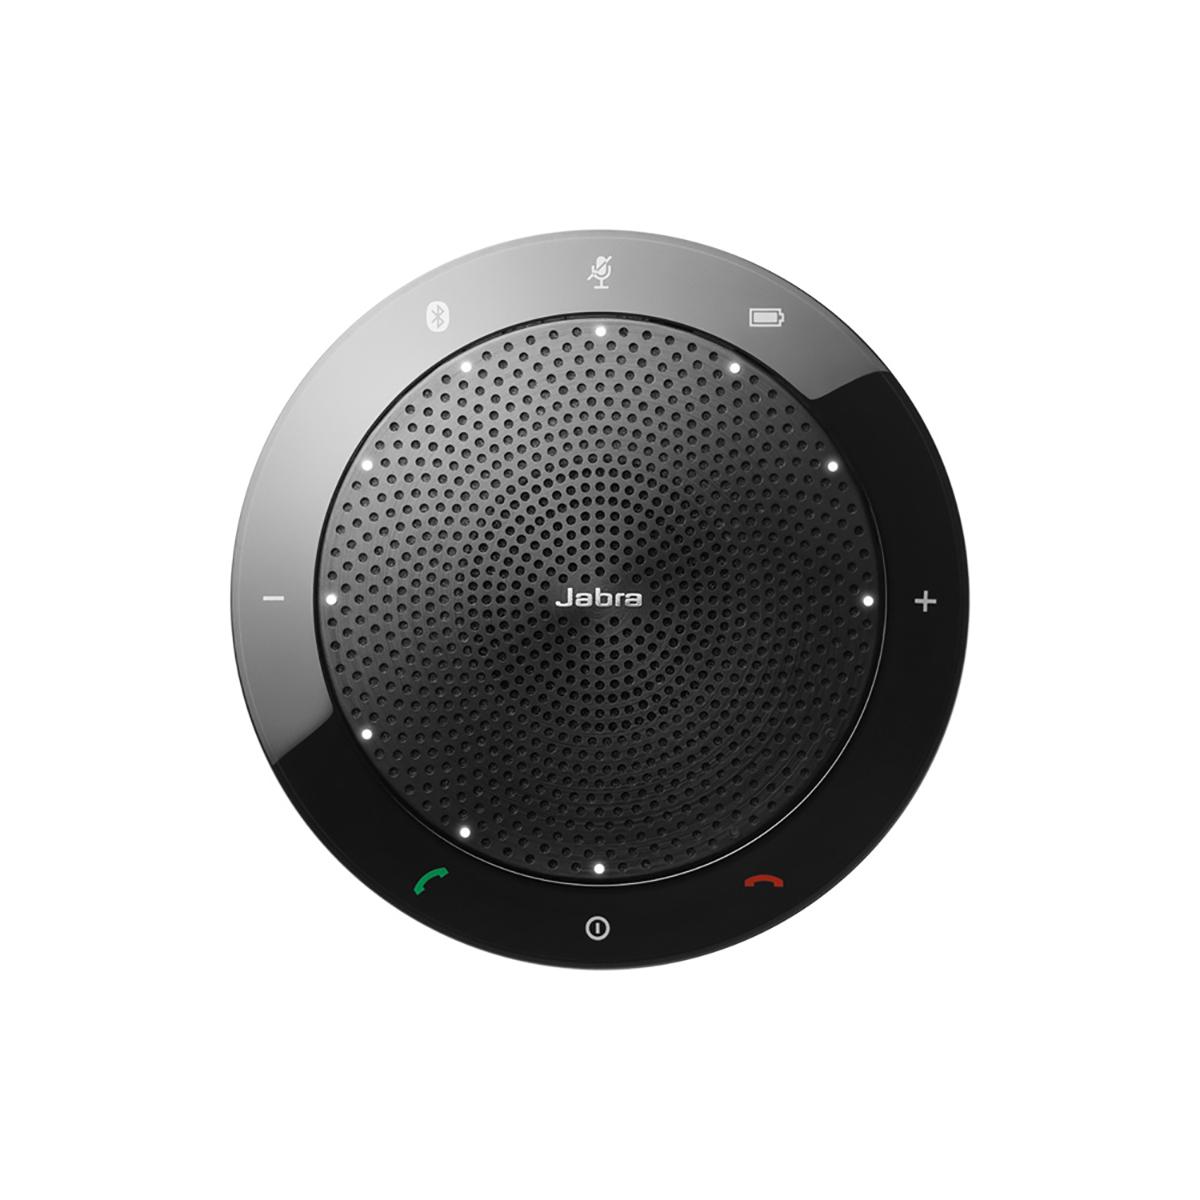 Jabra Speak 510 Plus MS and 360 Nano Dongle Conference Speakerphone